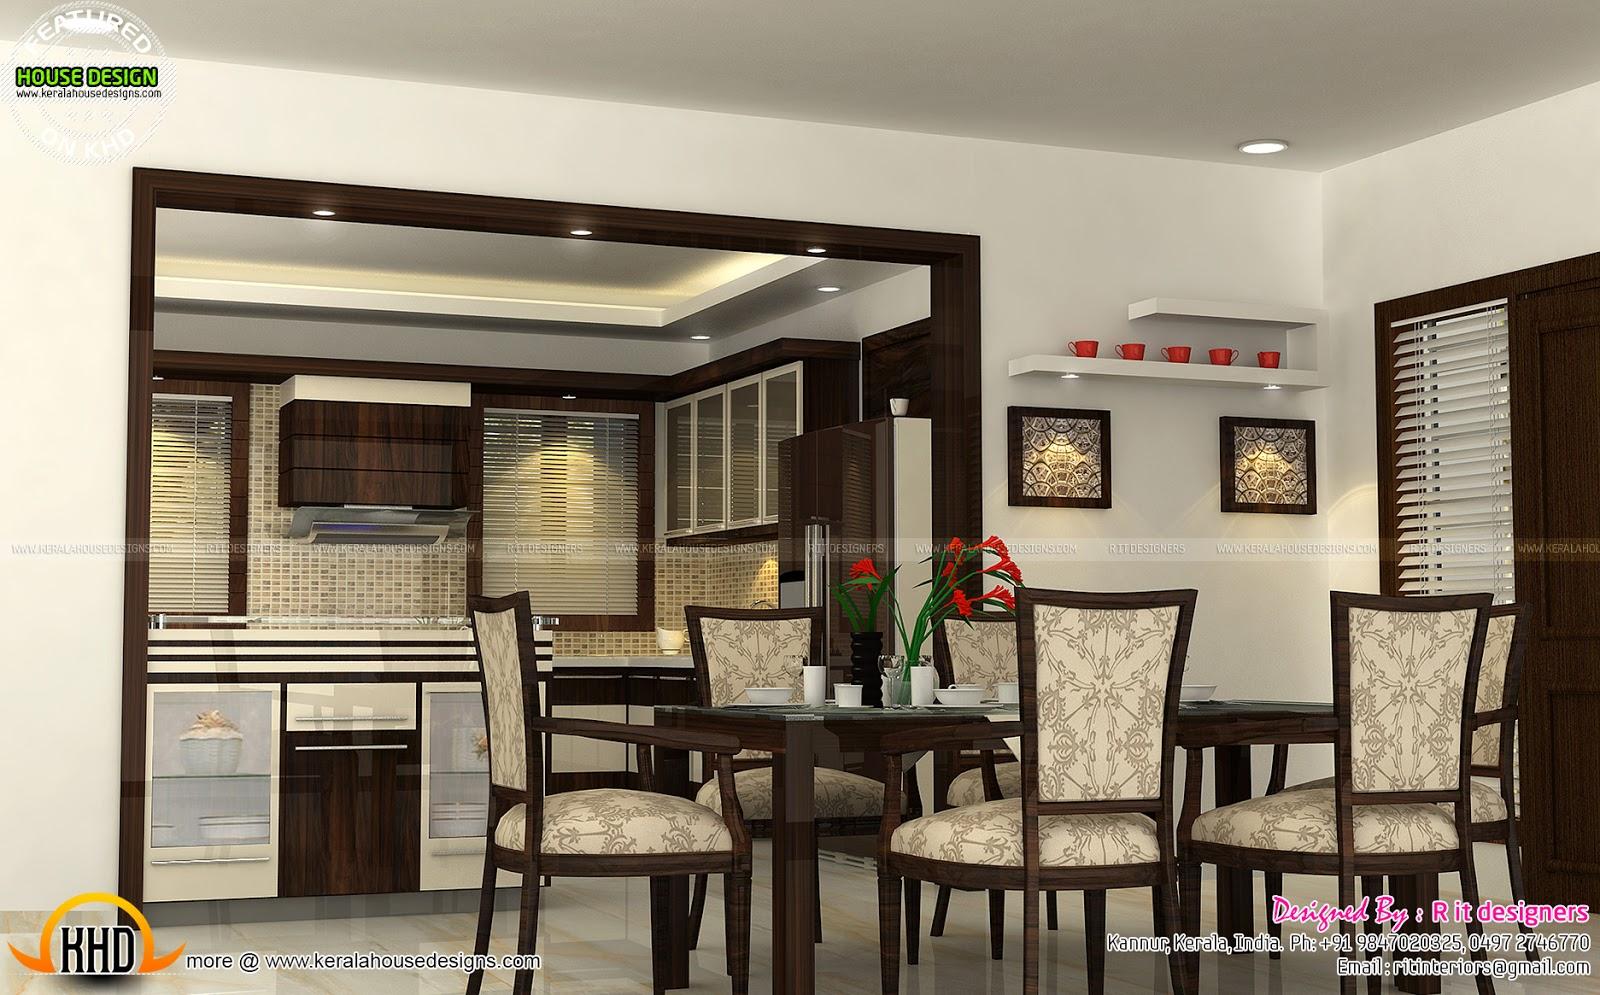 area dining kitchen interior kerala home design floor plans home kitchen design display interior exterior plan